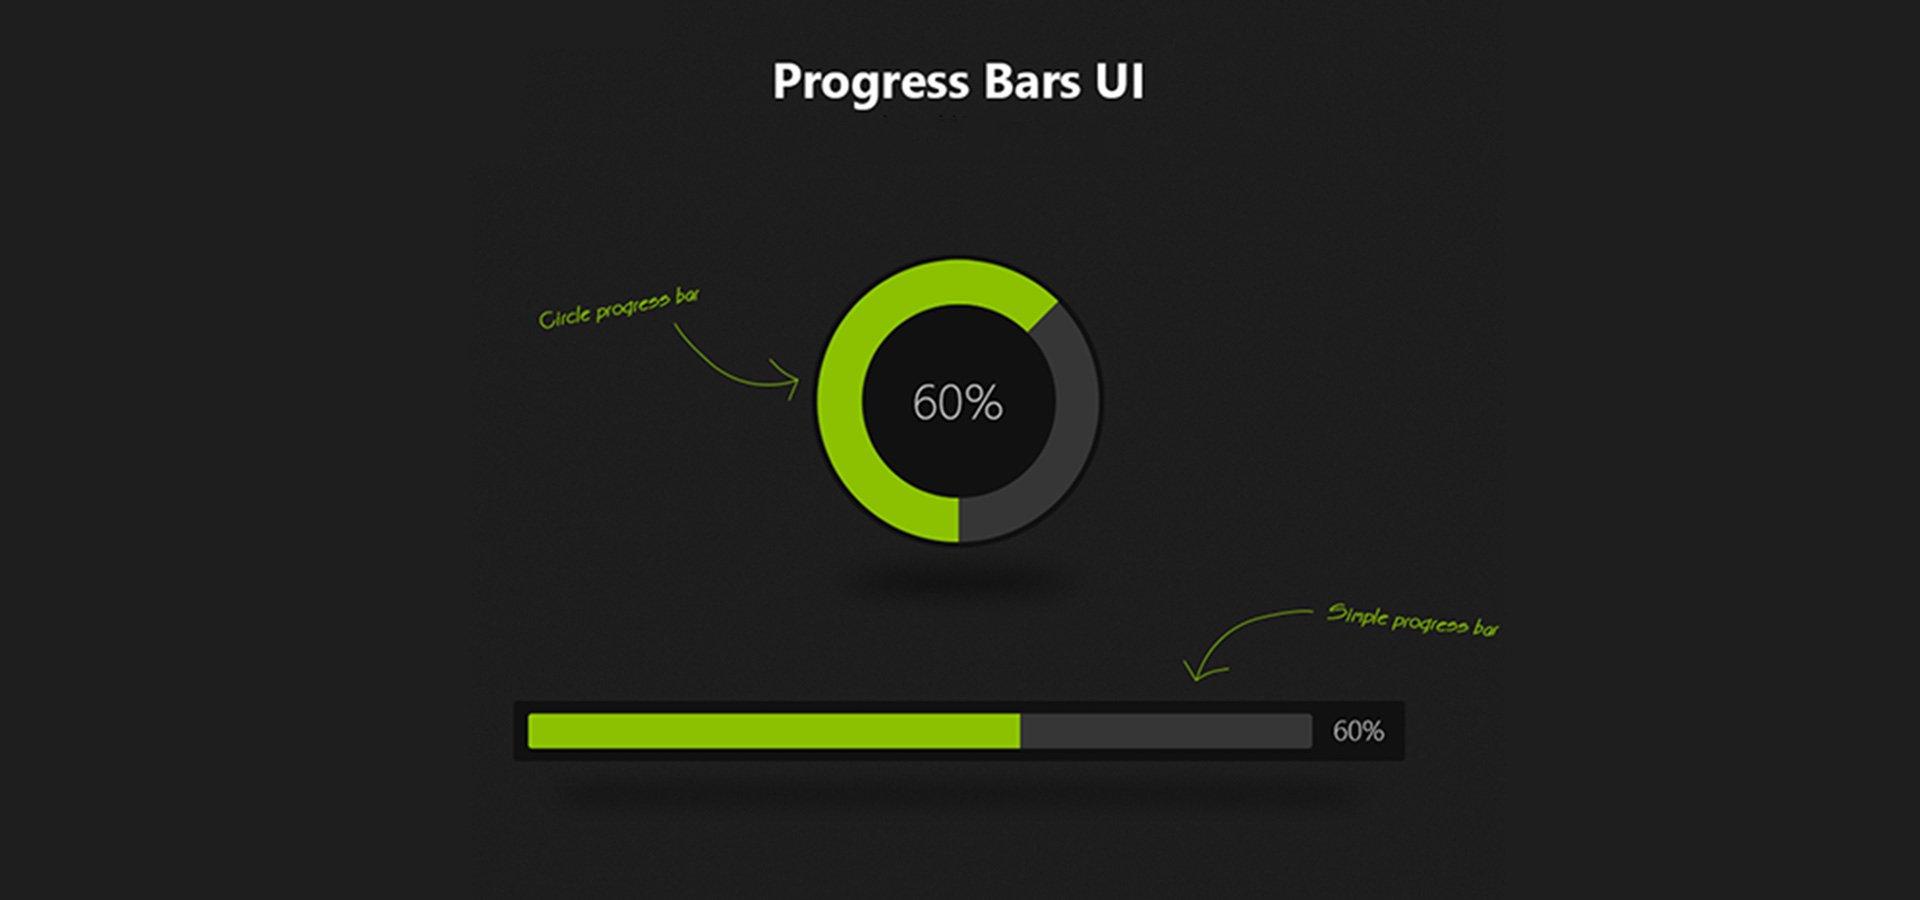 25+ Progress Bar Designs | Free & Premium Templates